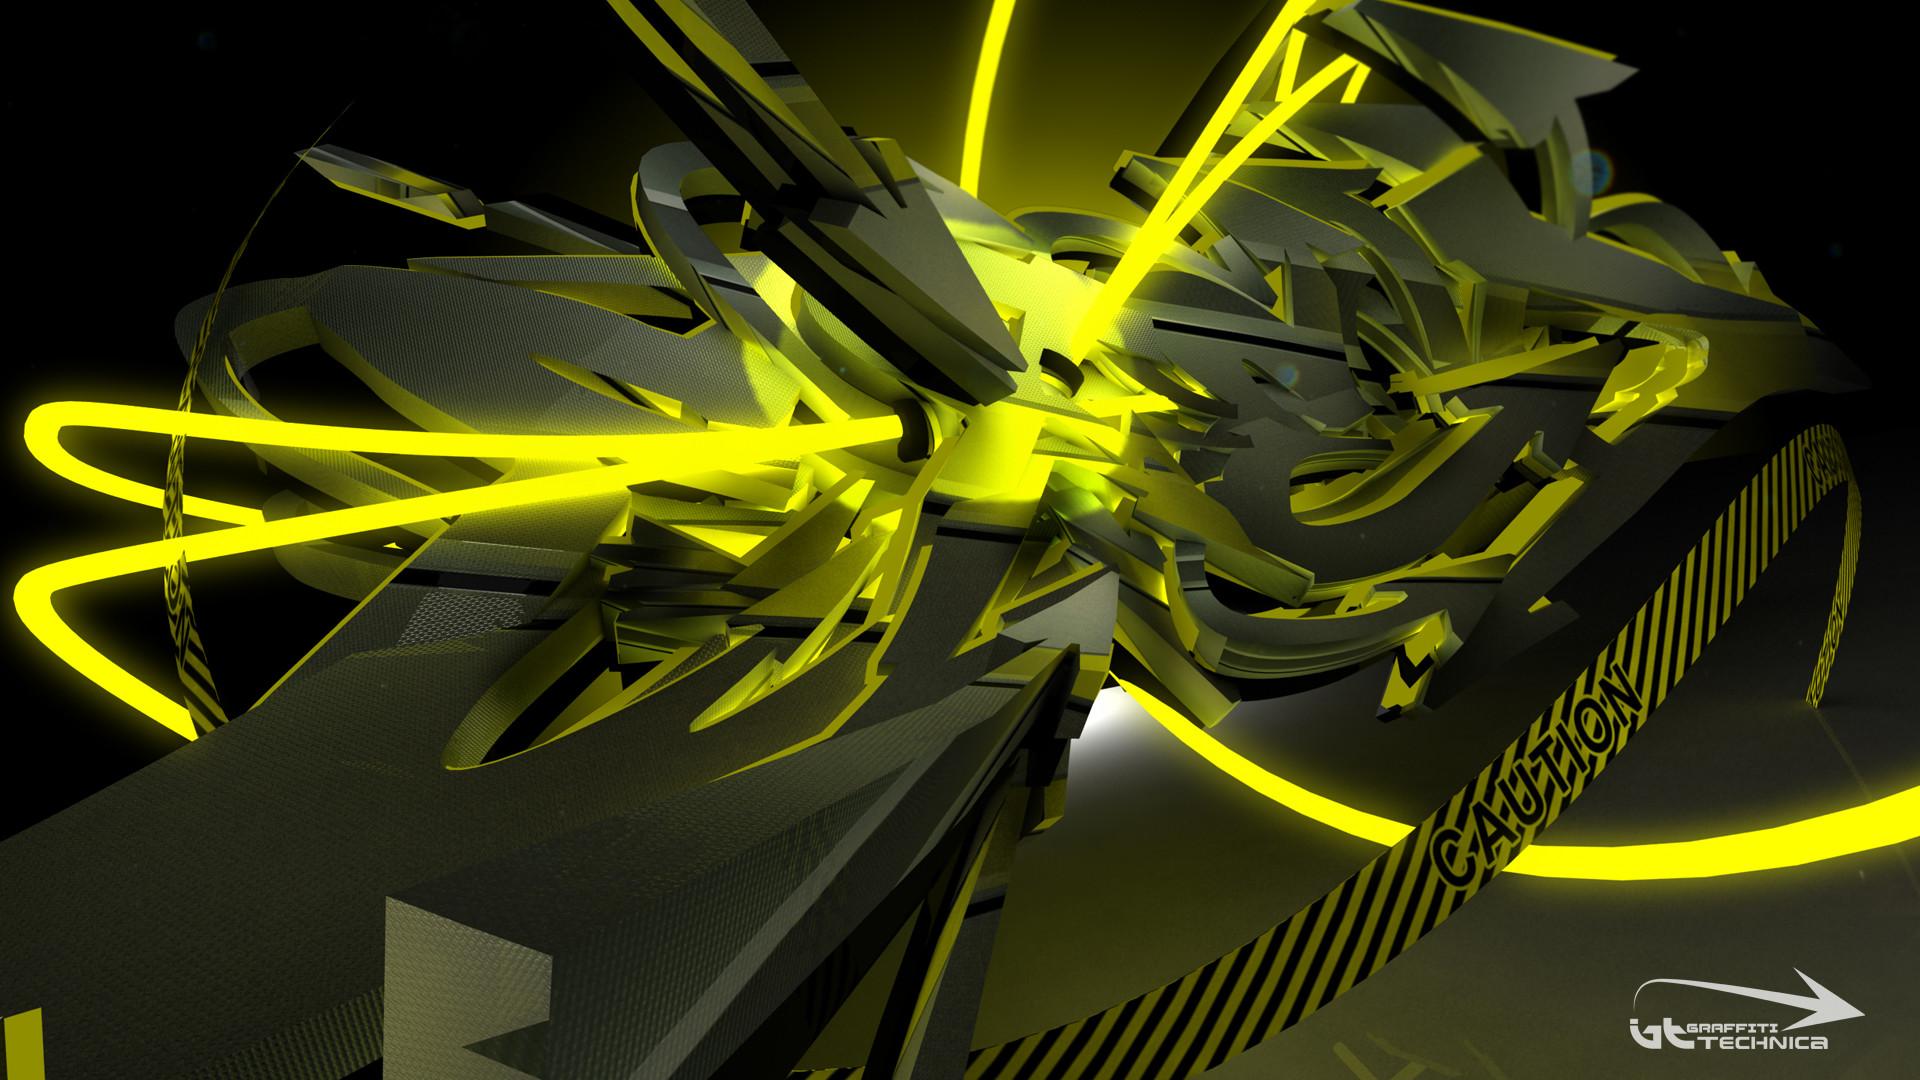 Desktop Graffiti Neon Tron Wallpaper and make this wallpaper for